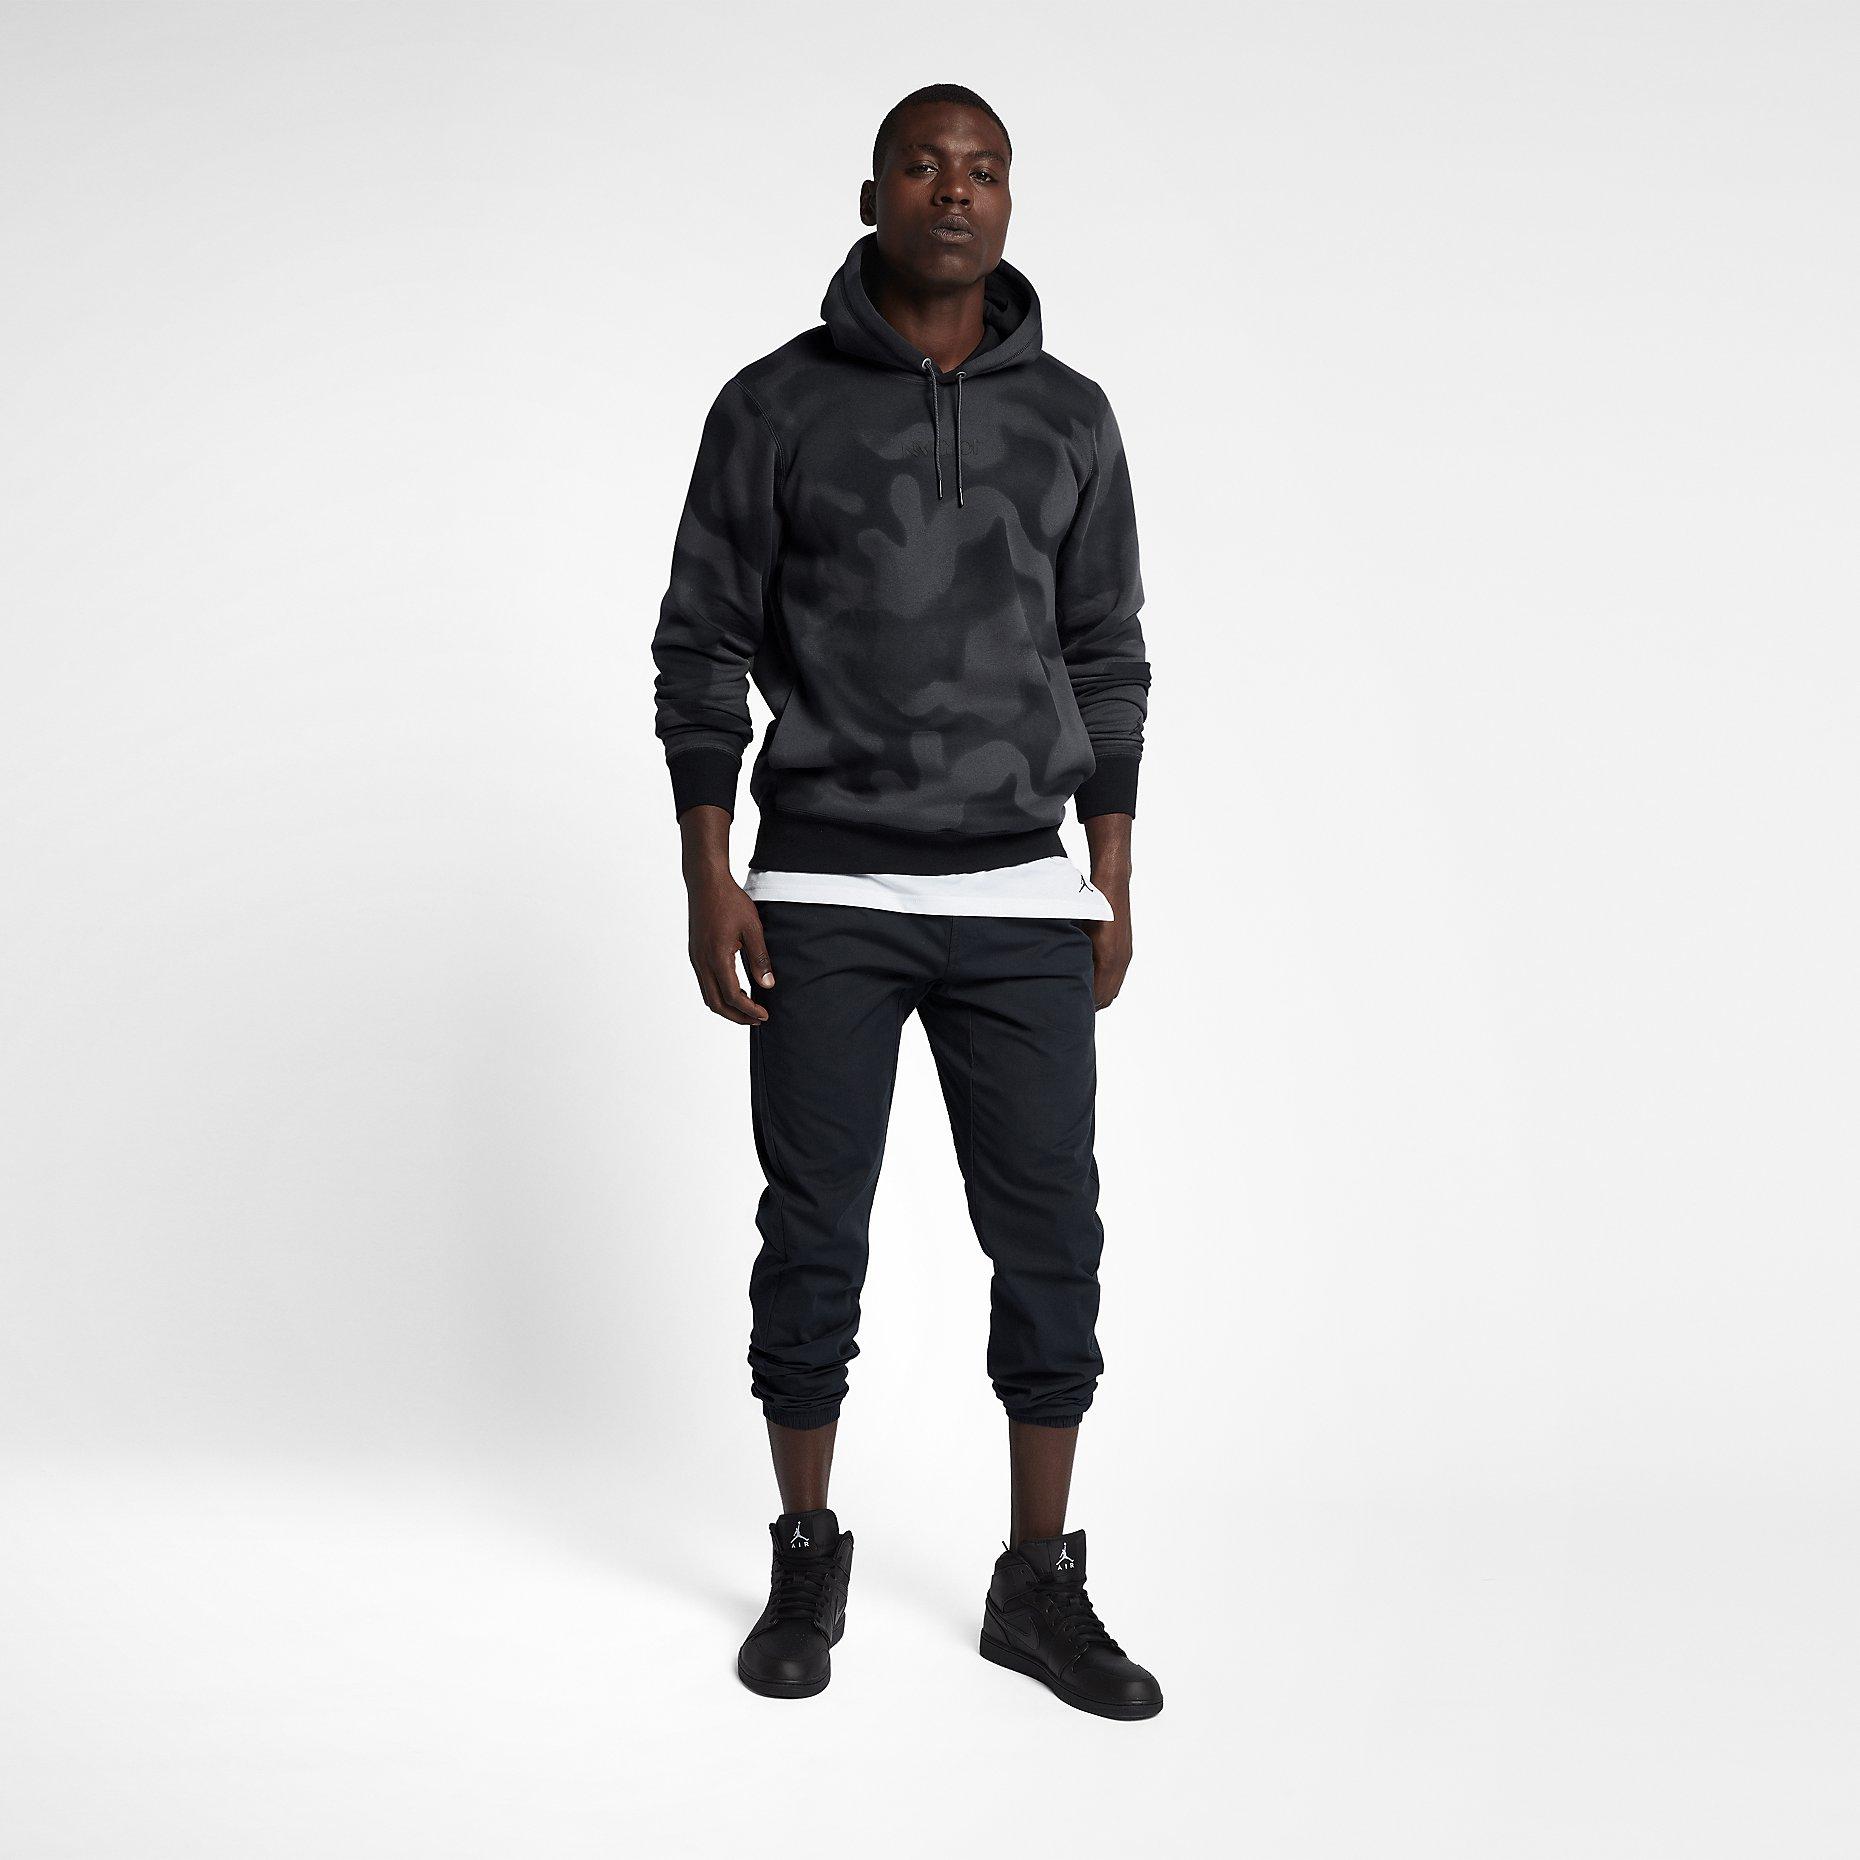 jordan-sportswear-p51-flight-mens-fleece-pullover-hoodie (3).jpg